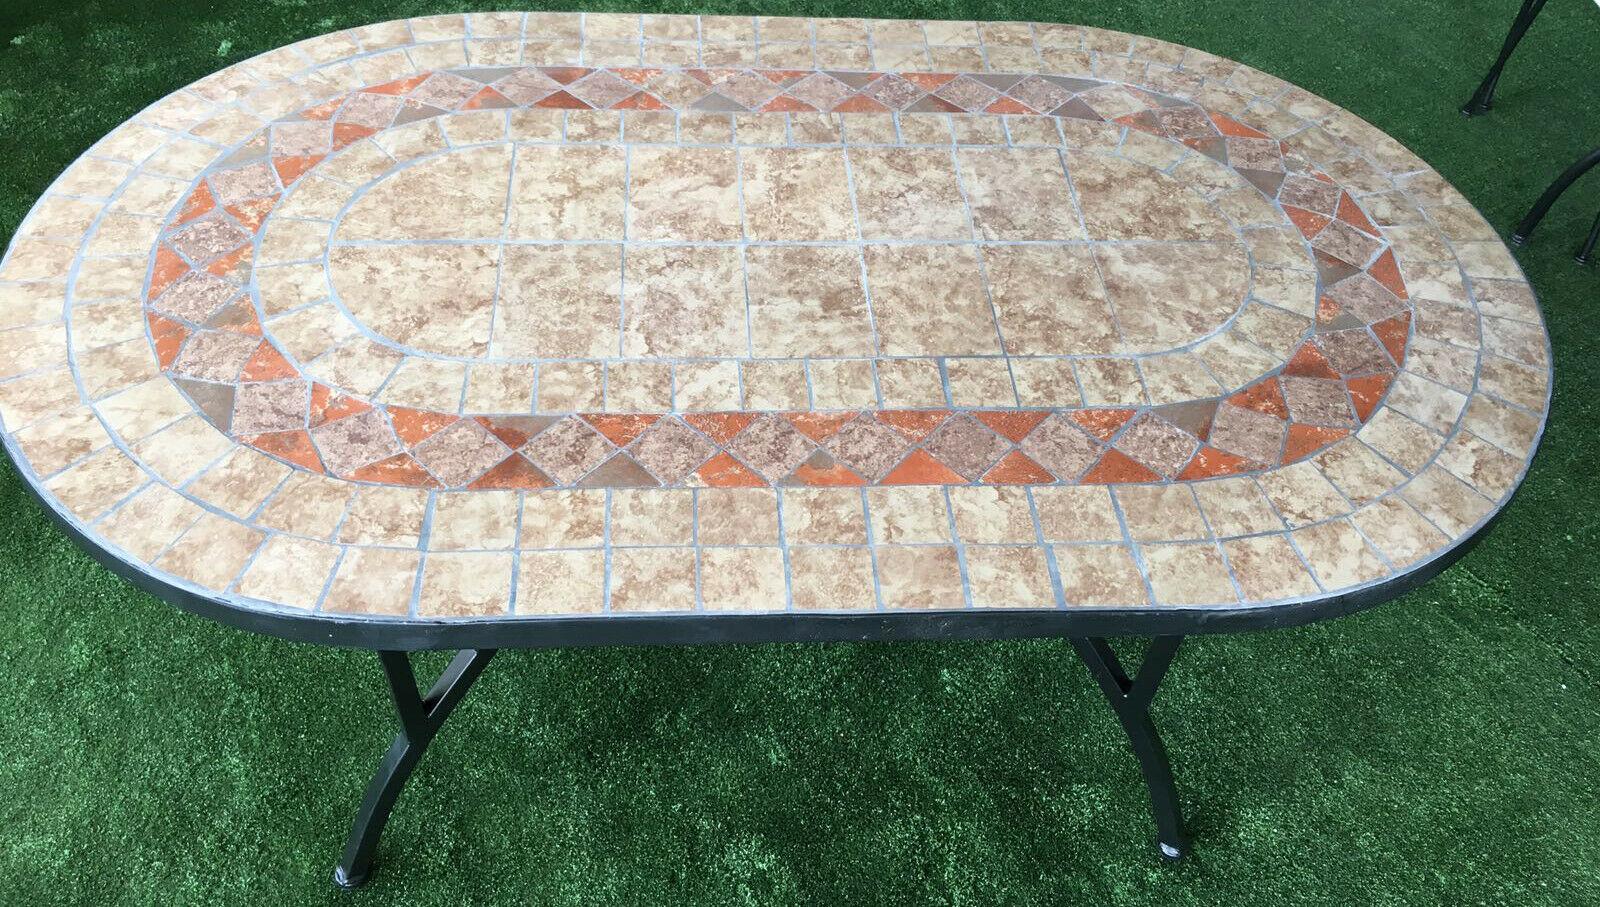 Tavolo Da Giardino Mosaico.Tavolo Da Giardino Ovale Con Mosaico Base In Acciaio Robusto Cm 150x90x745